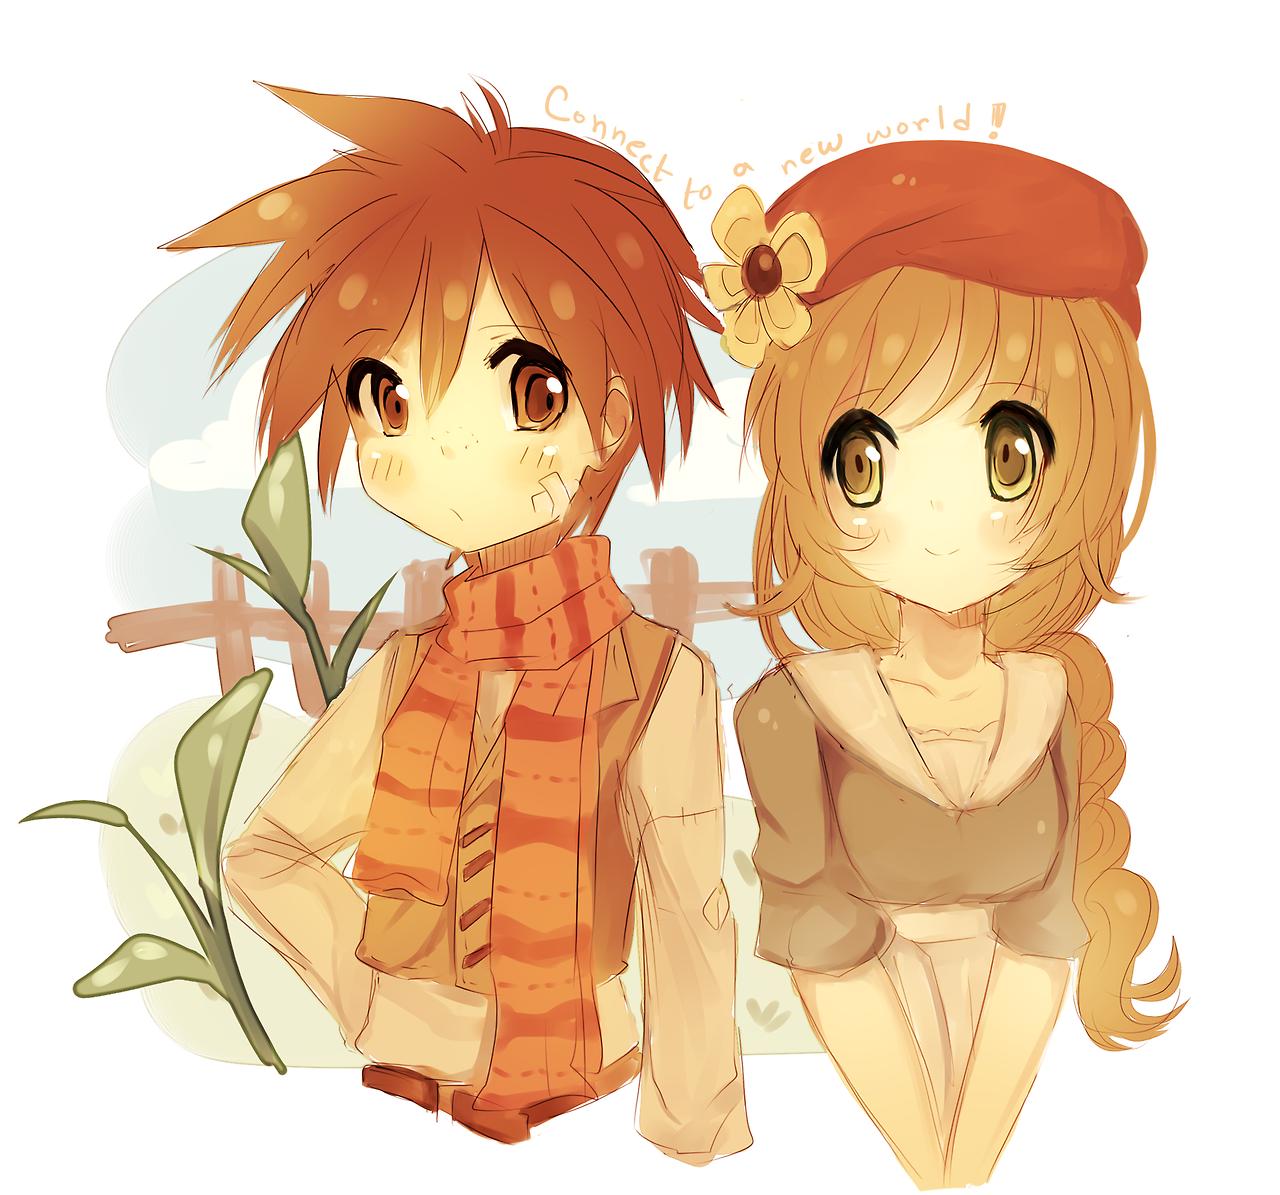 Harvest Moon Harvest moon, Harvest moon game, Anime